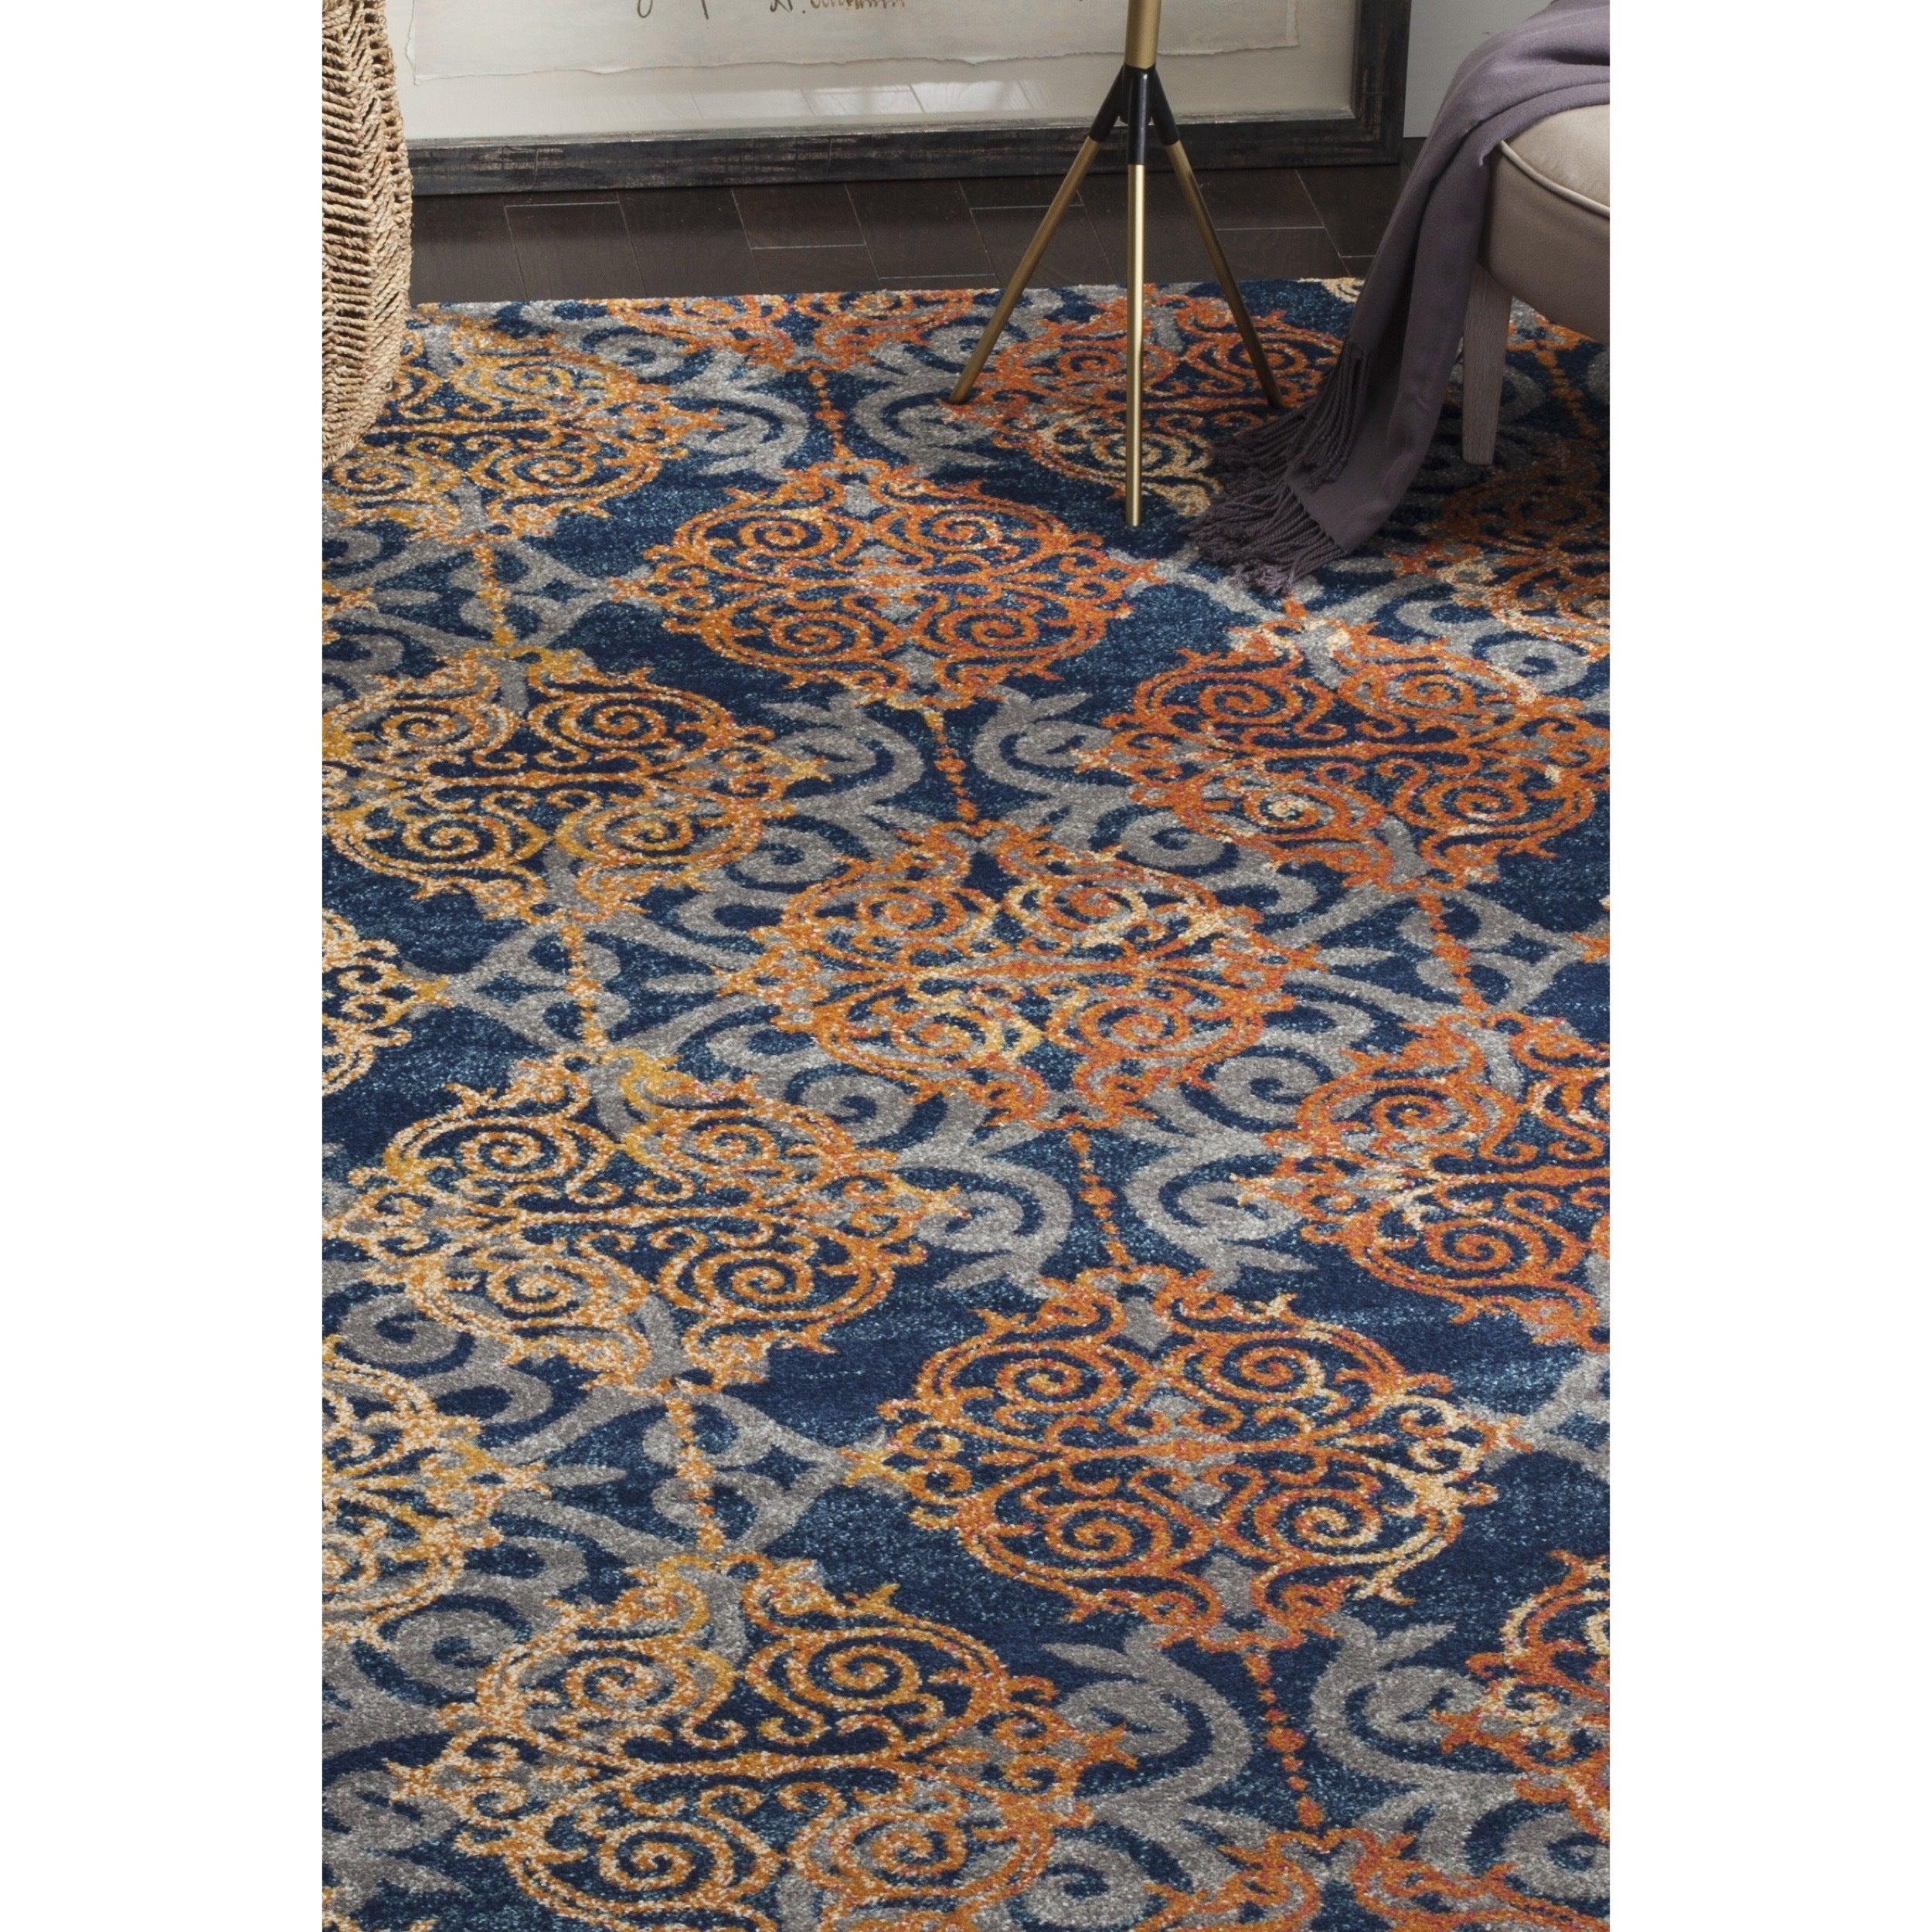 safavieh evoke vintage damask blue orange distressed rug (' x ')  freeshipping today  overstockcom  . safavieh evoke vintage damask blue orange distressed rug (' x